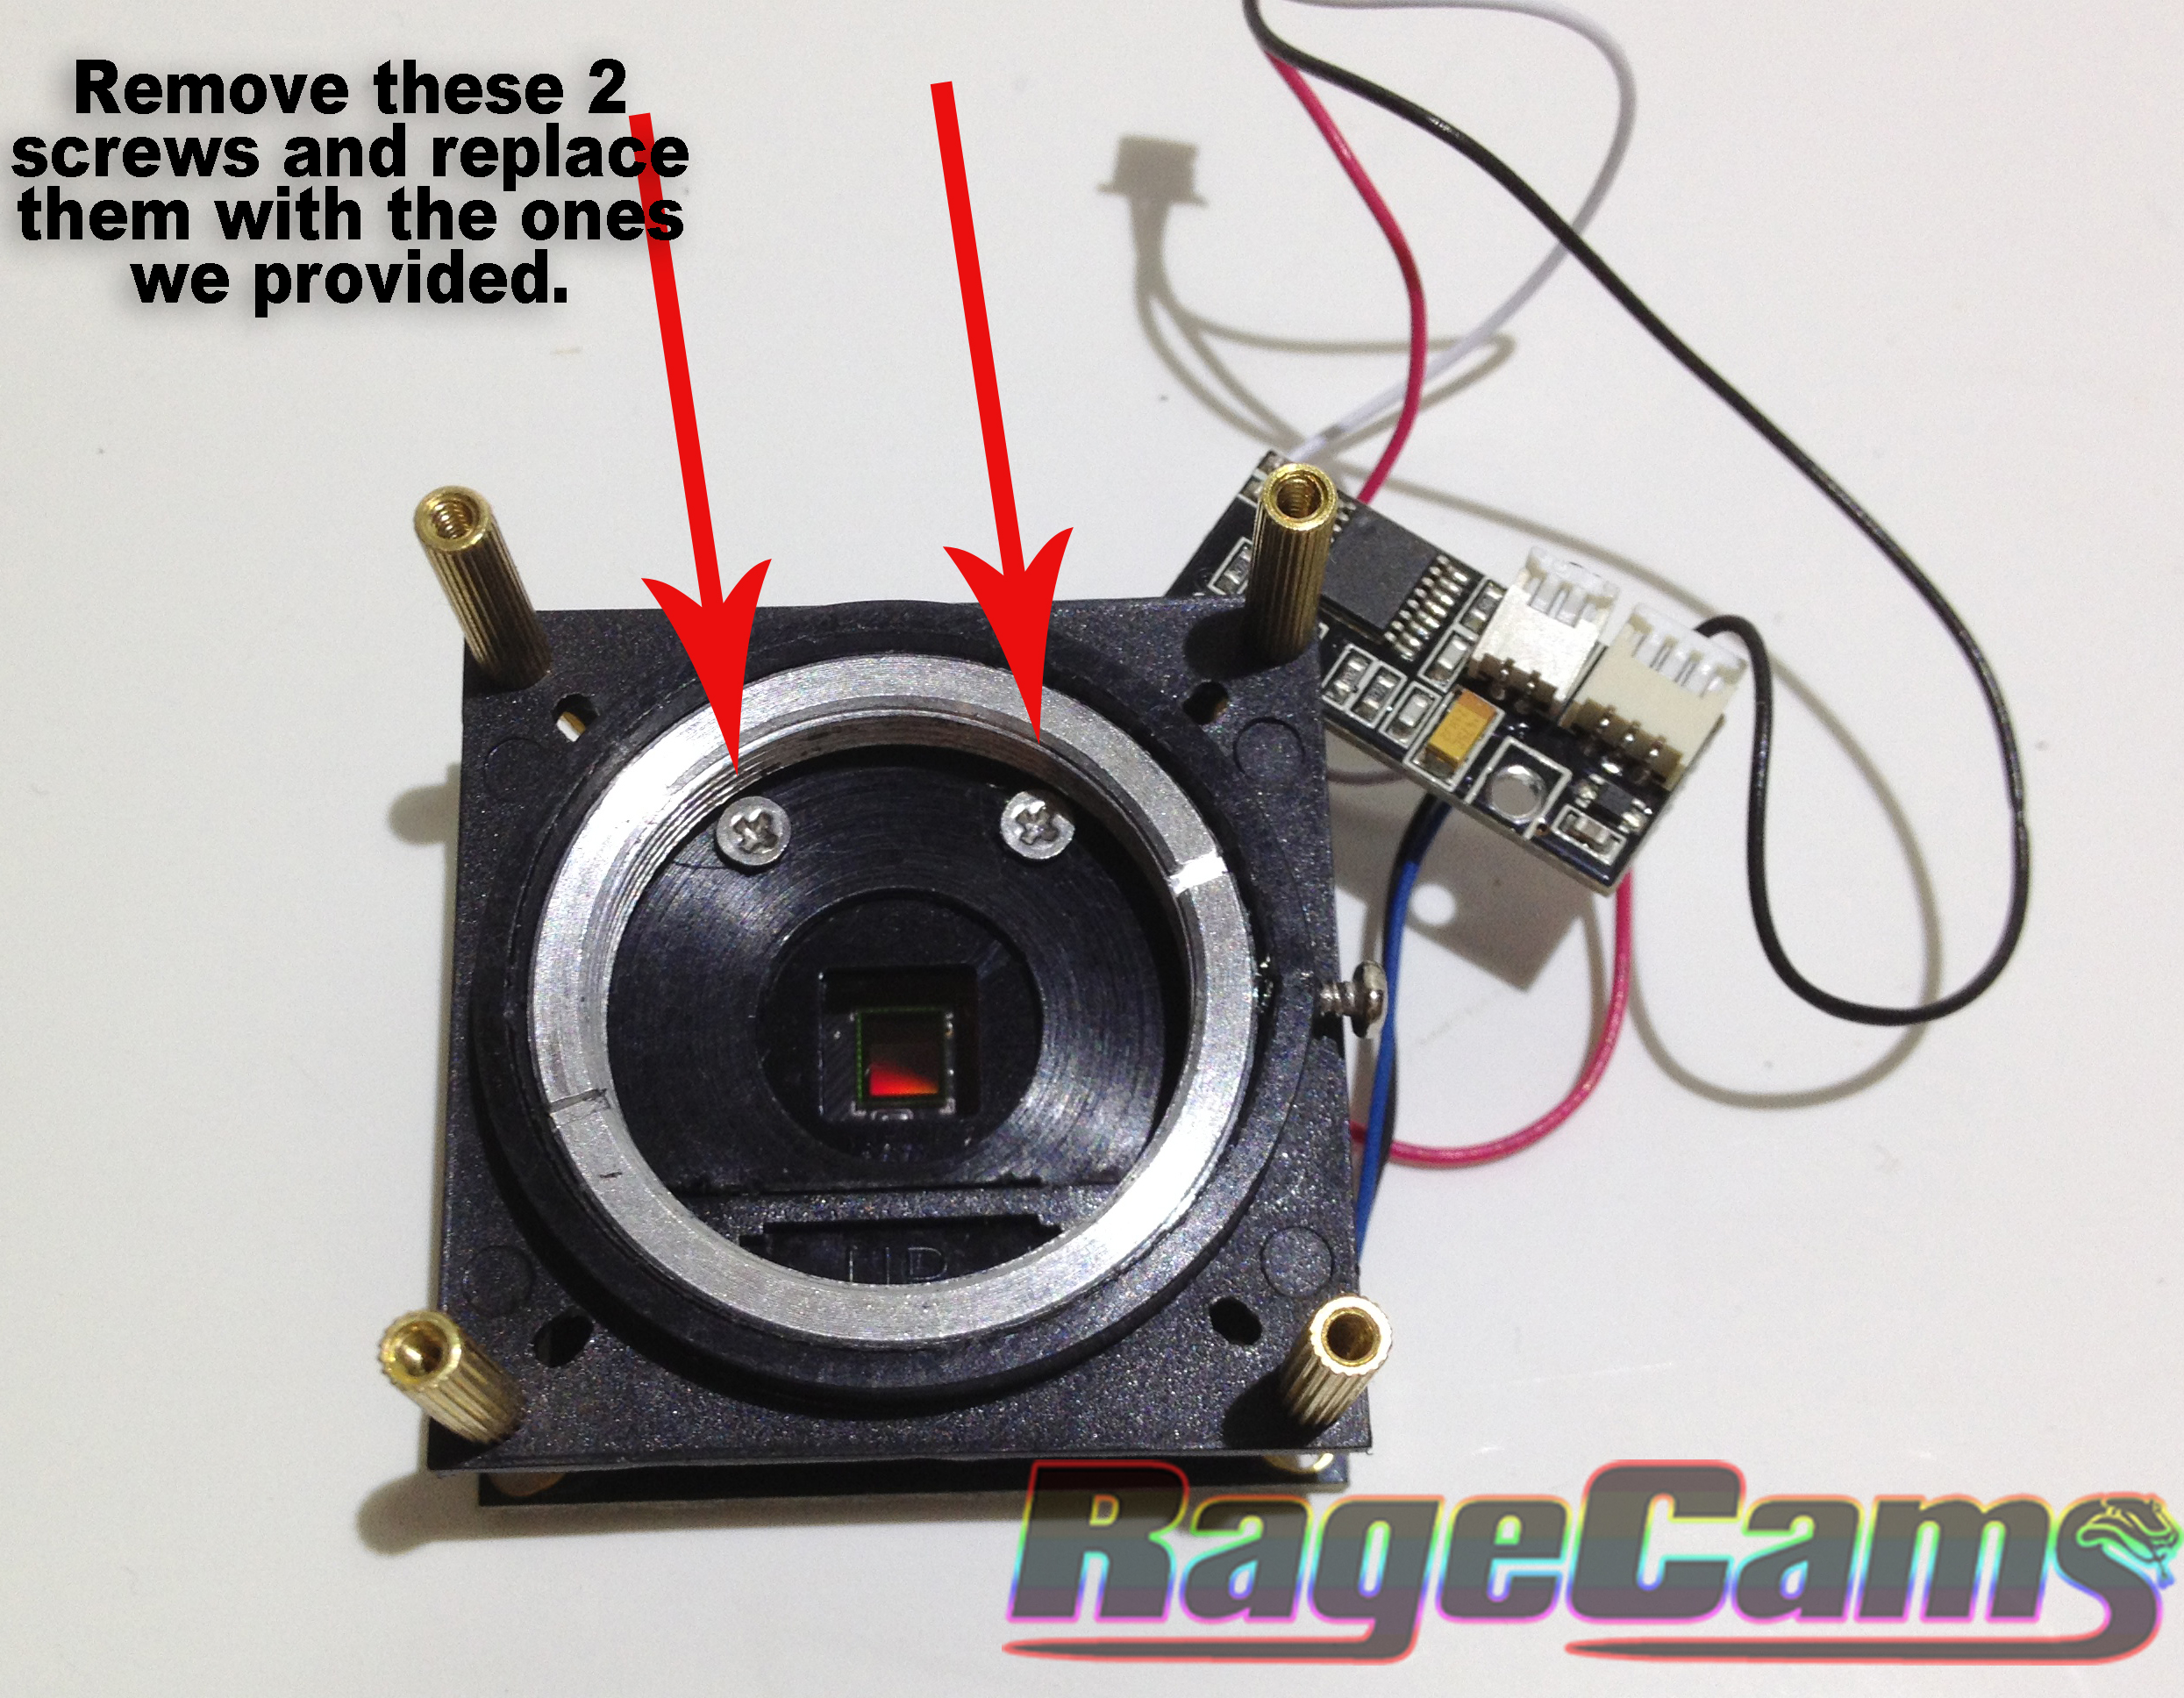 RageCams 2.8mm cs lens for the foscam fi8905w fixed iris | HD Wearable Video Custom Mods By RageCams